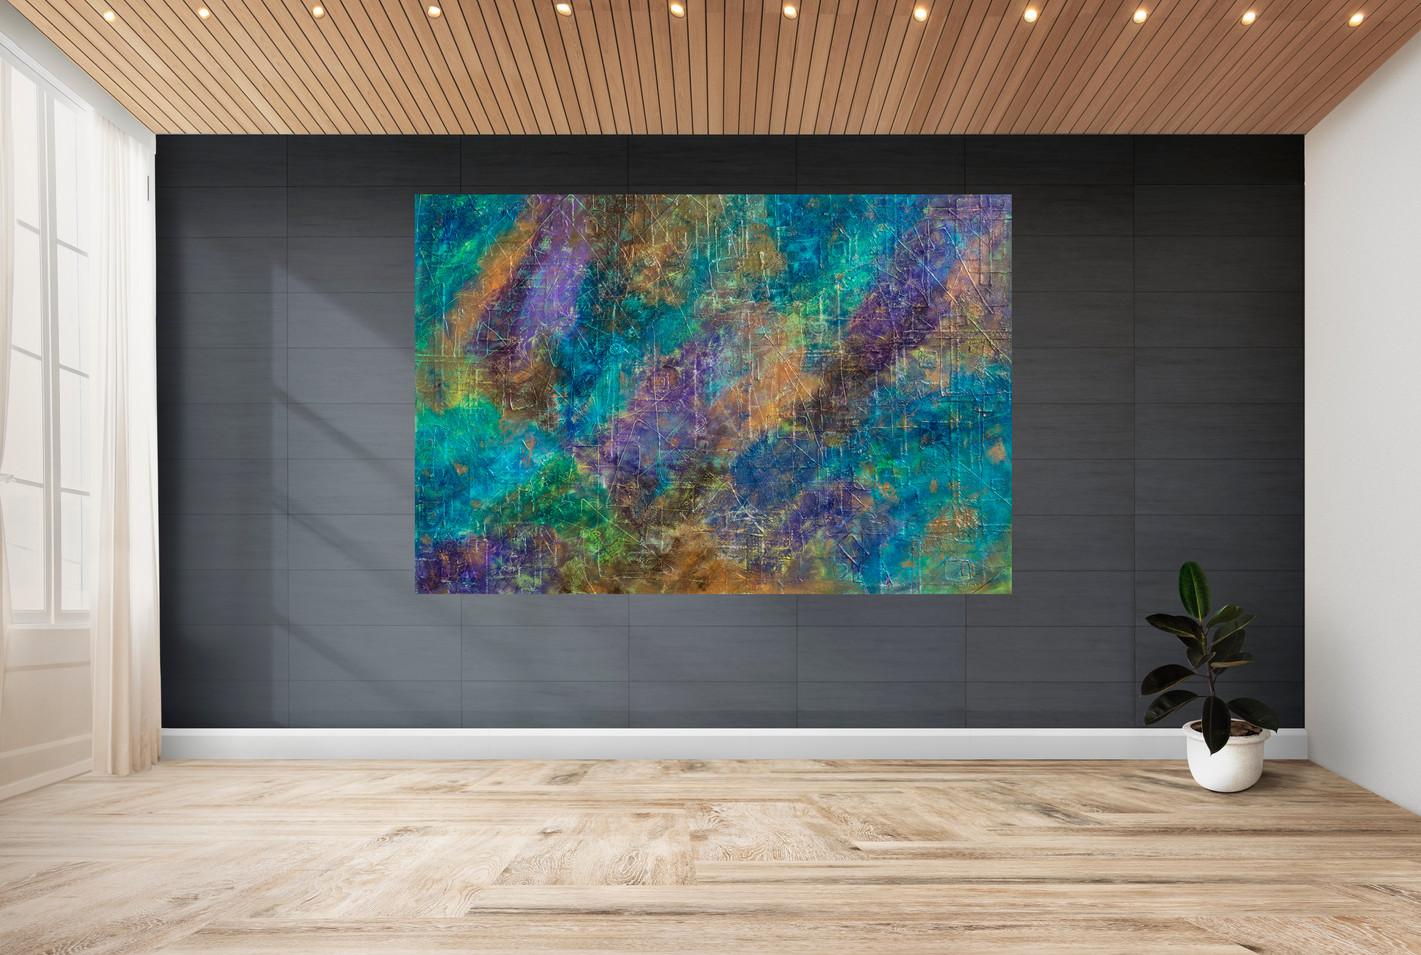 Celeste #22 | large original art in staged view